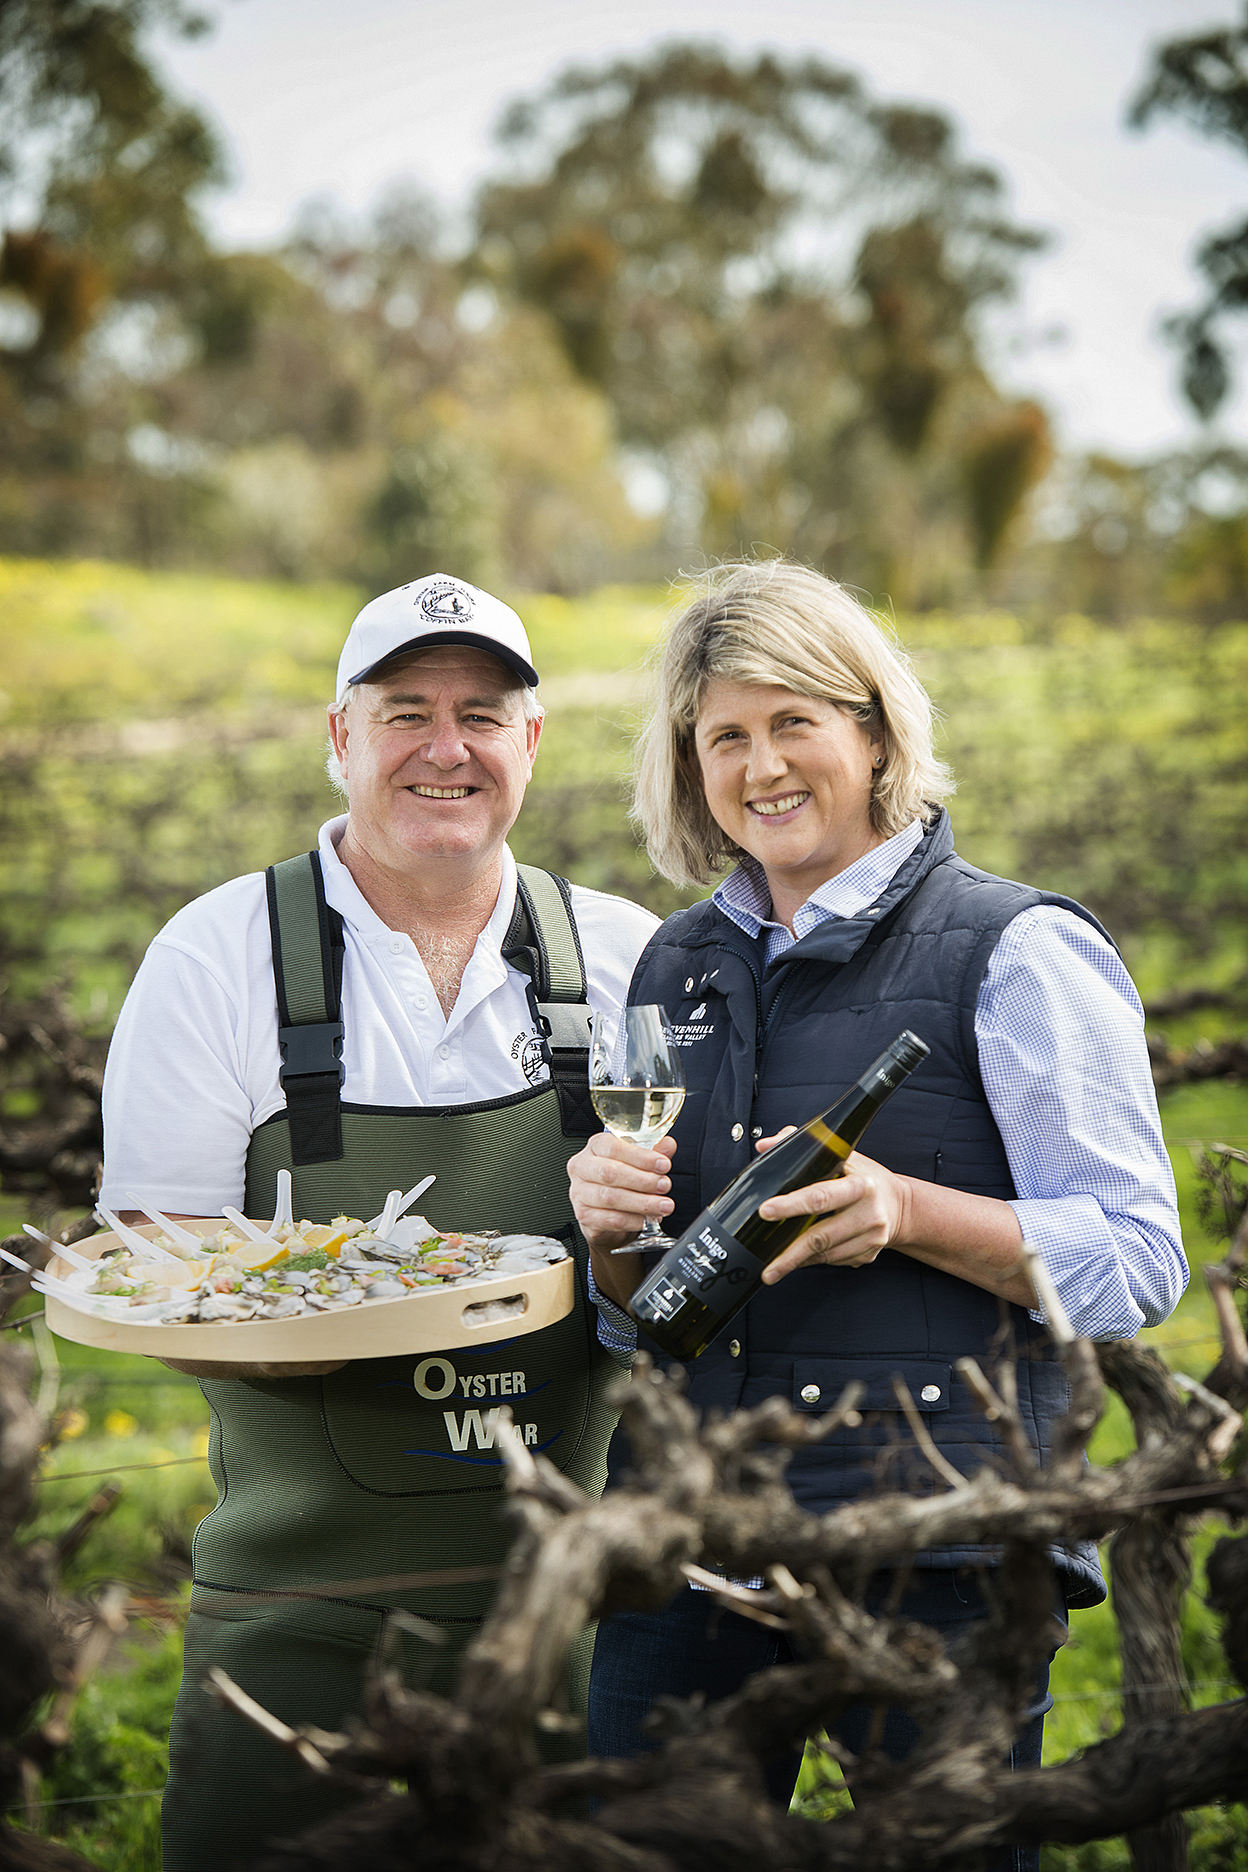 CHP_Export_143861486_Oyster farmer Ben Catterall Coffin Bay Oyster Events  & wine maker Liz Heidenre.jpg